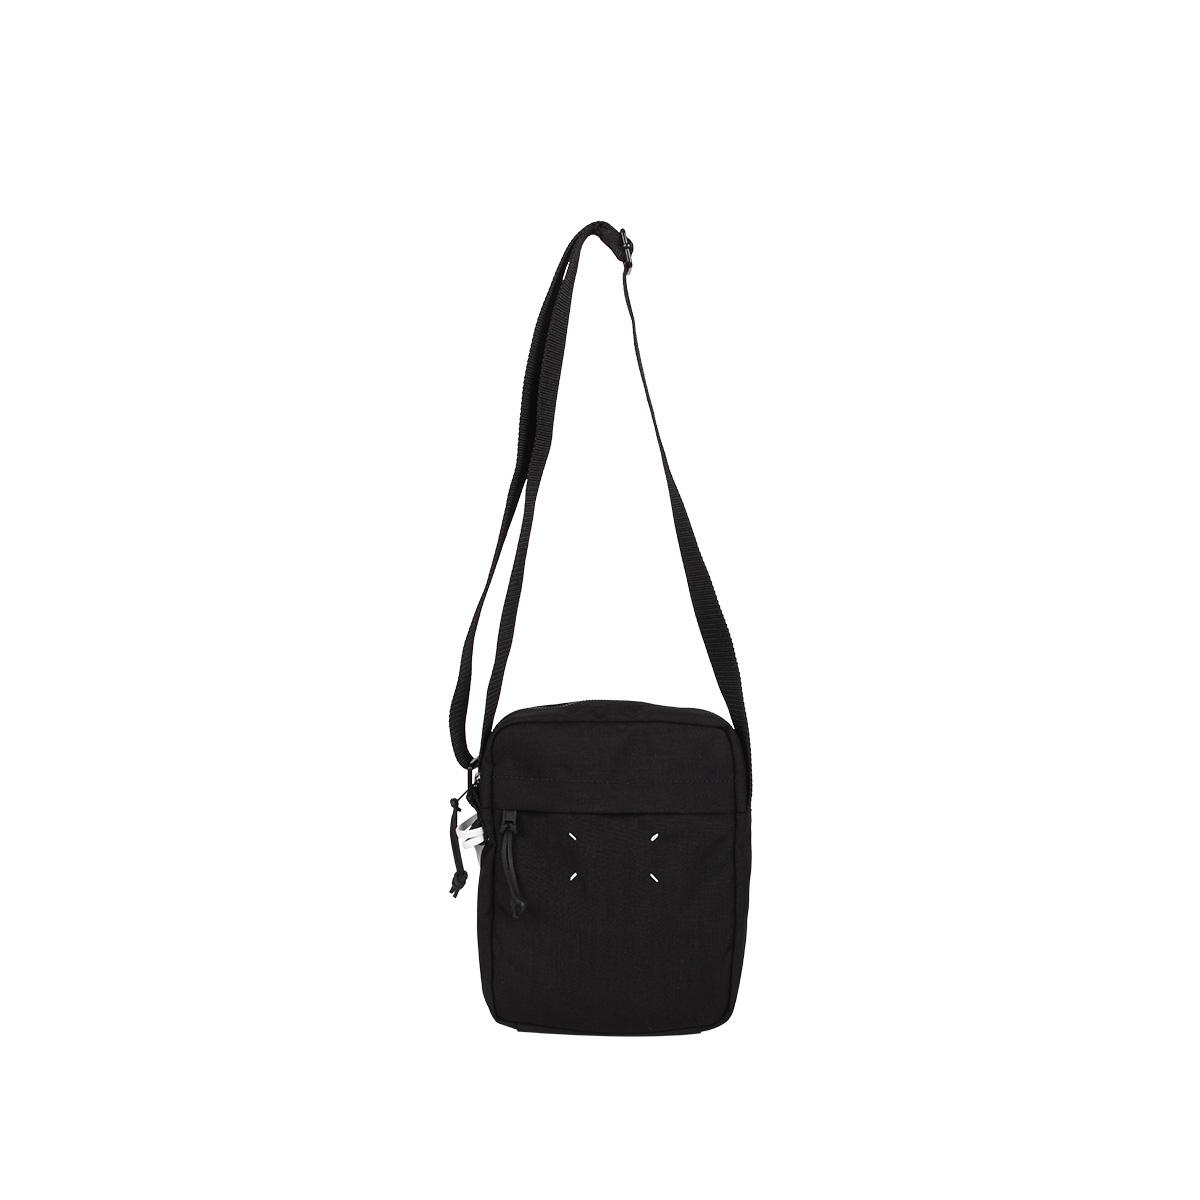 MAISON MARGIELA SHOULDER BAG メゾンマルジェラ バッグ ショルダーバッグ メンズ レディース ブラック 黒 S55WG0056-T8013